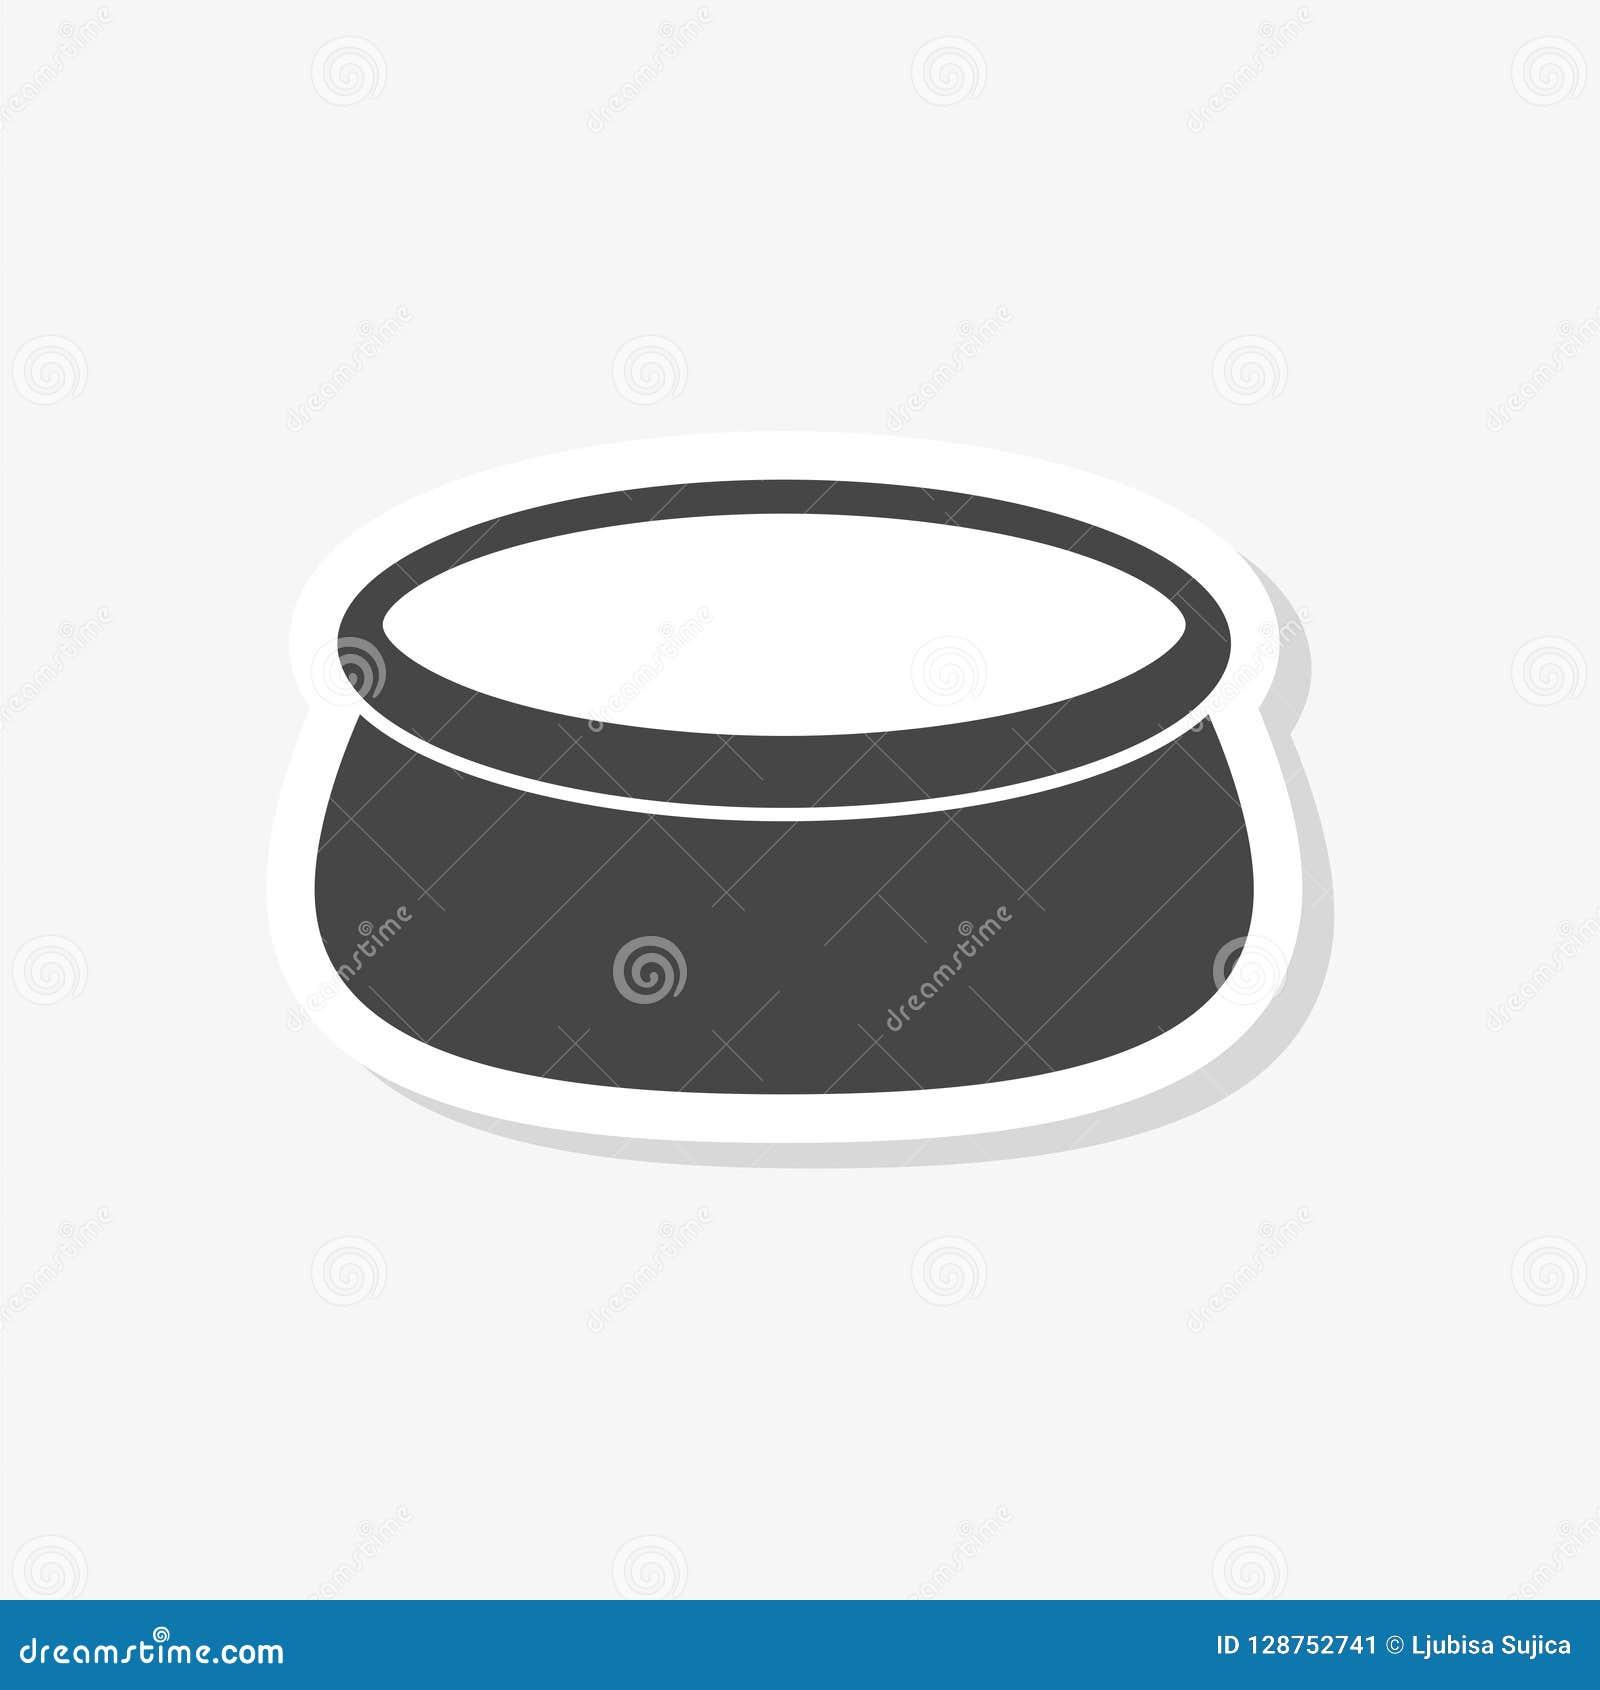 Swimming Pool Logo Pool Sticker Stock Vector Illustration of